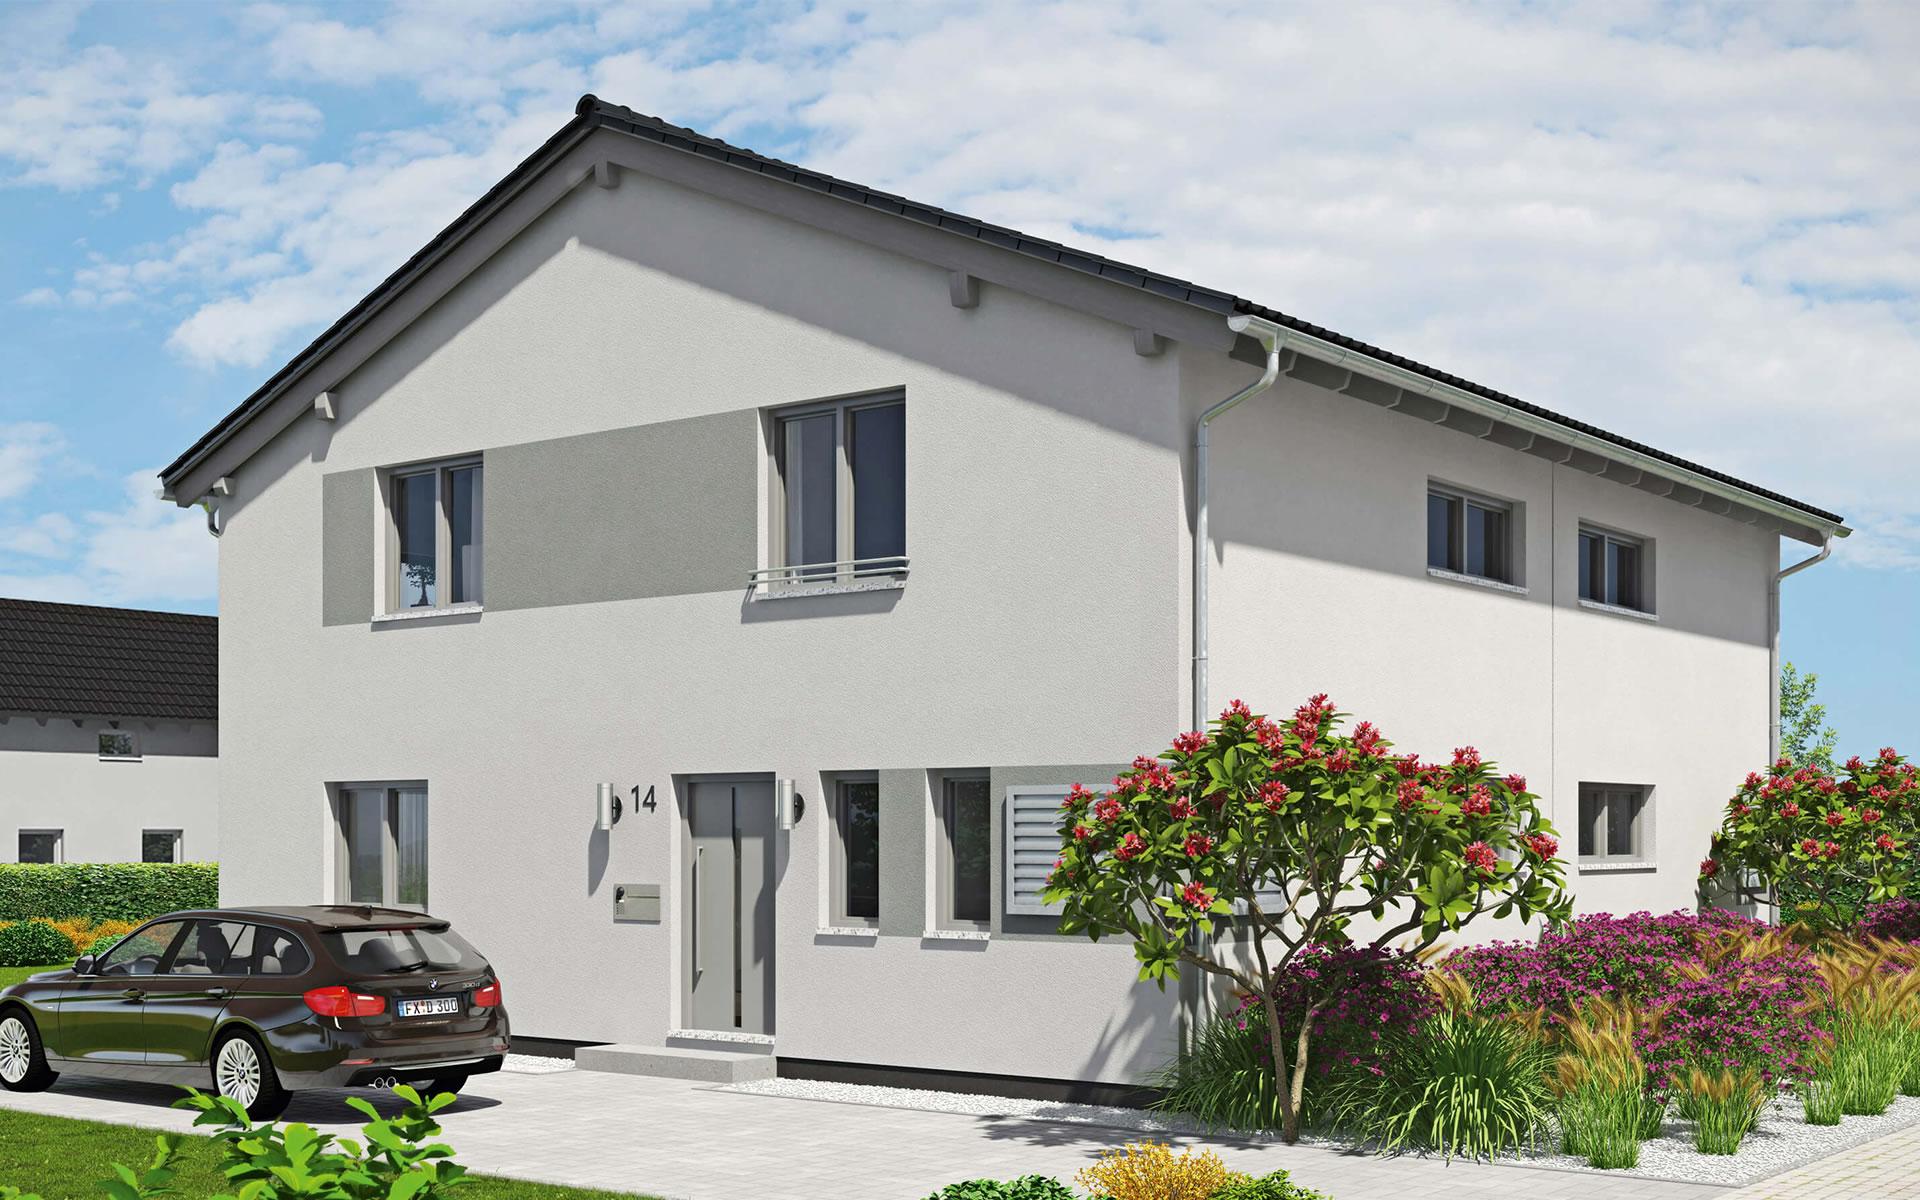 Duett 114 - Fingerhut Haus GmbH & Co. KG